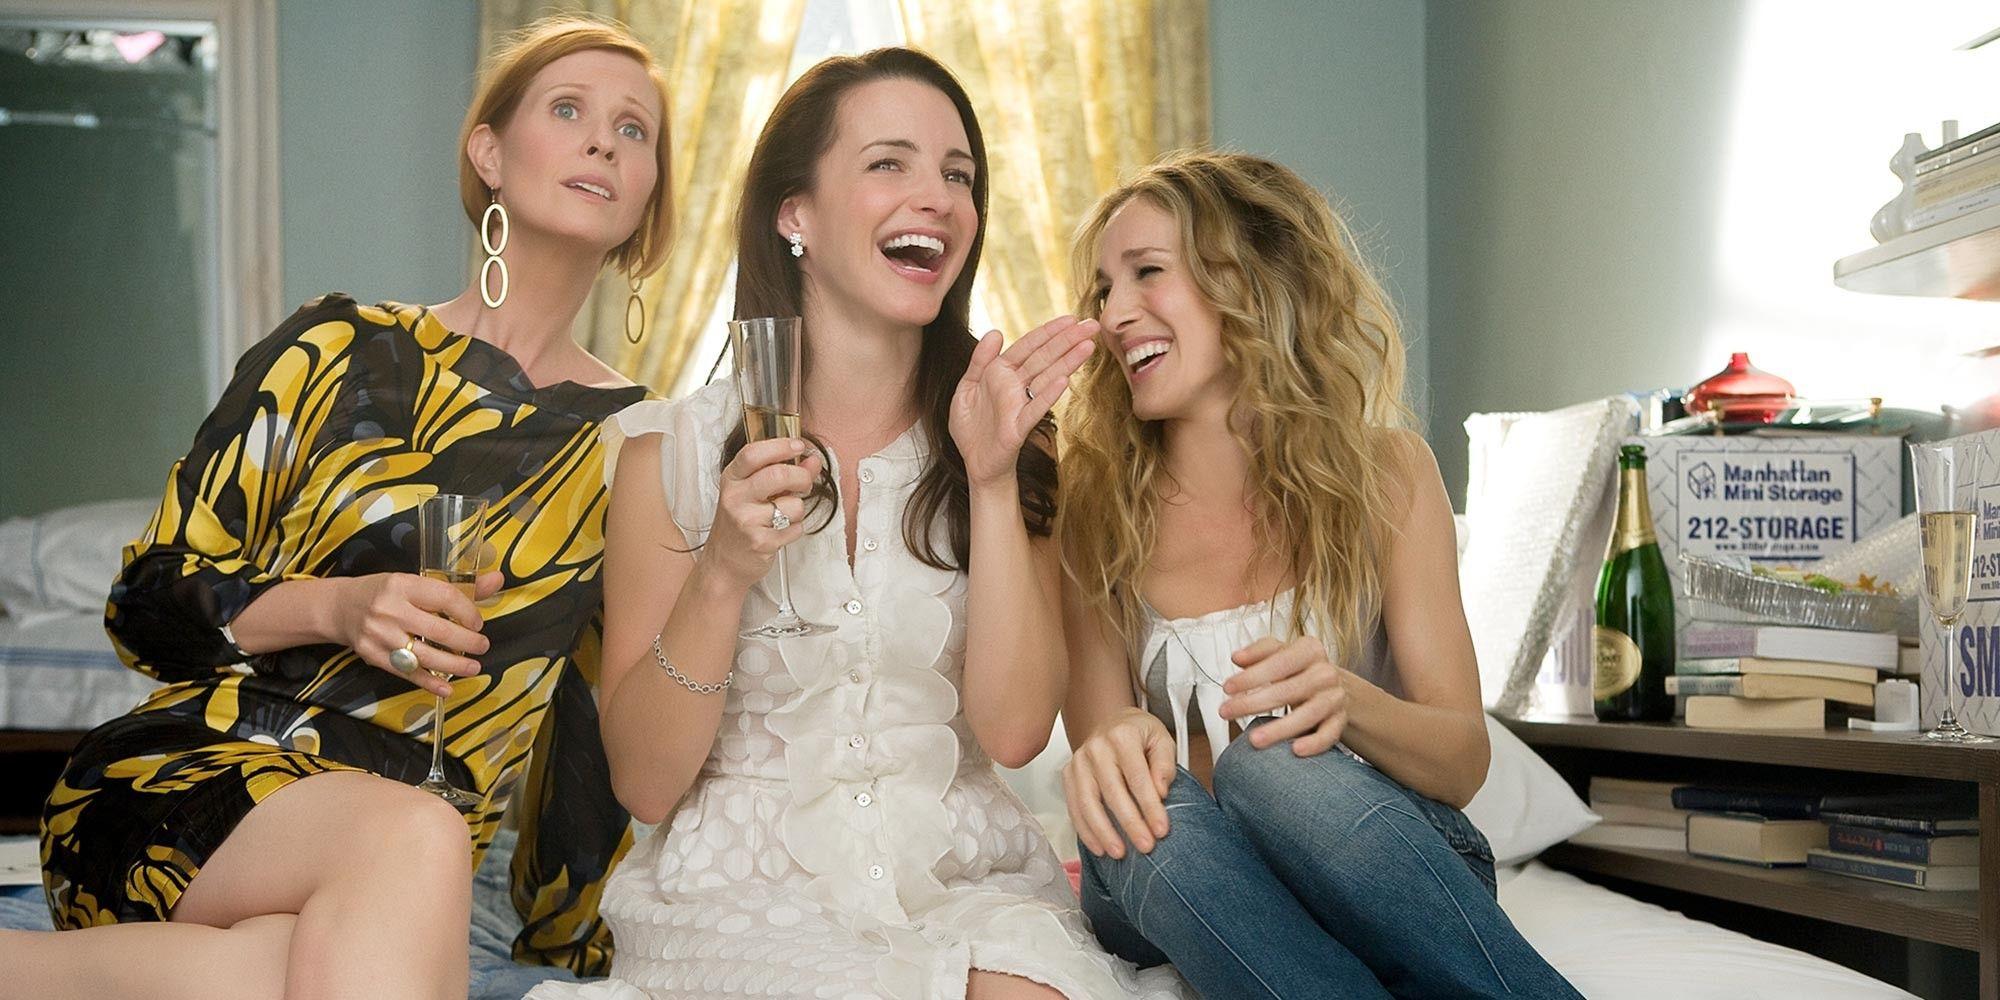 Sex & the City Revival Shoots This Summer, Casts Grey's Anatomy's Sara Ramírez